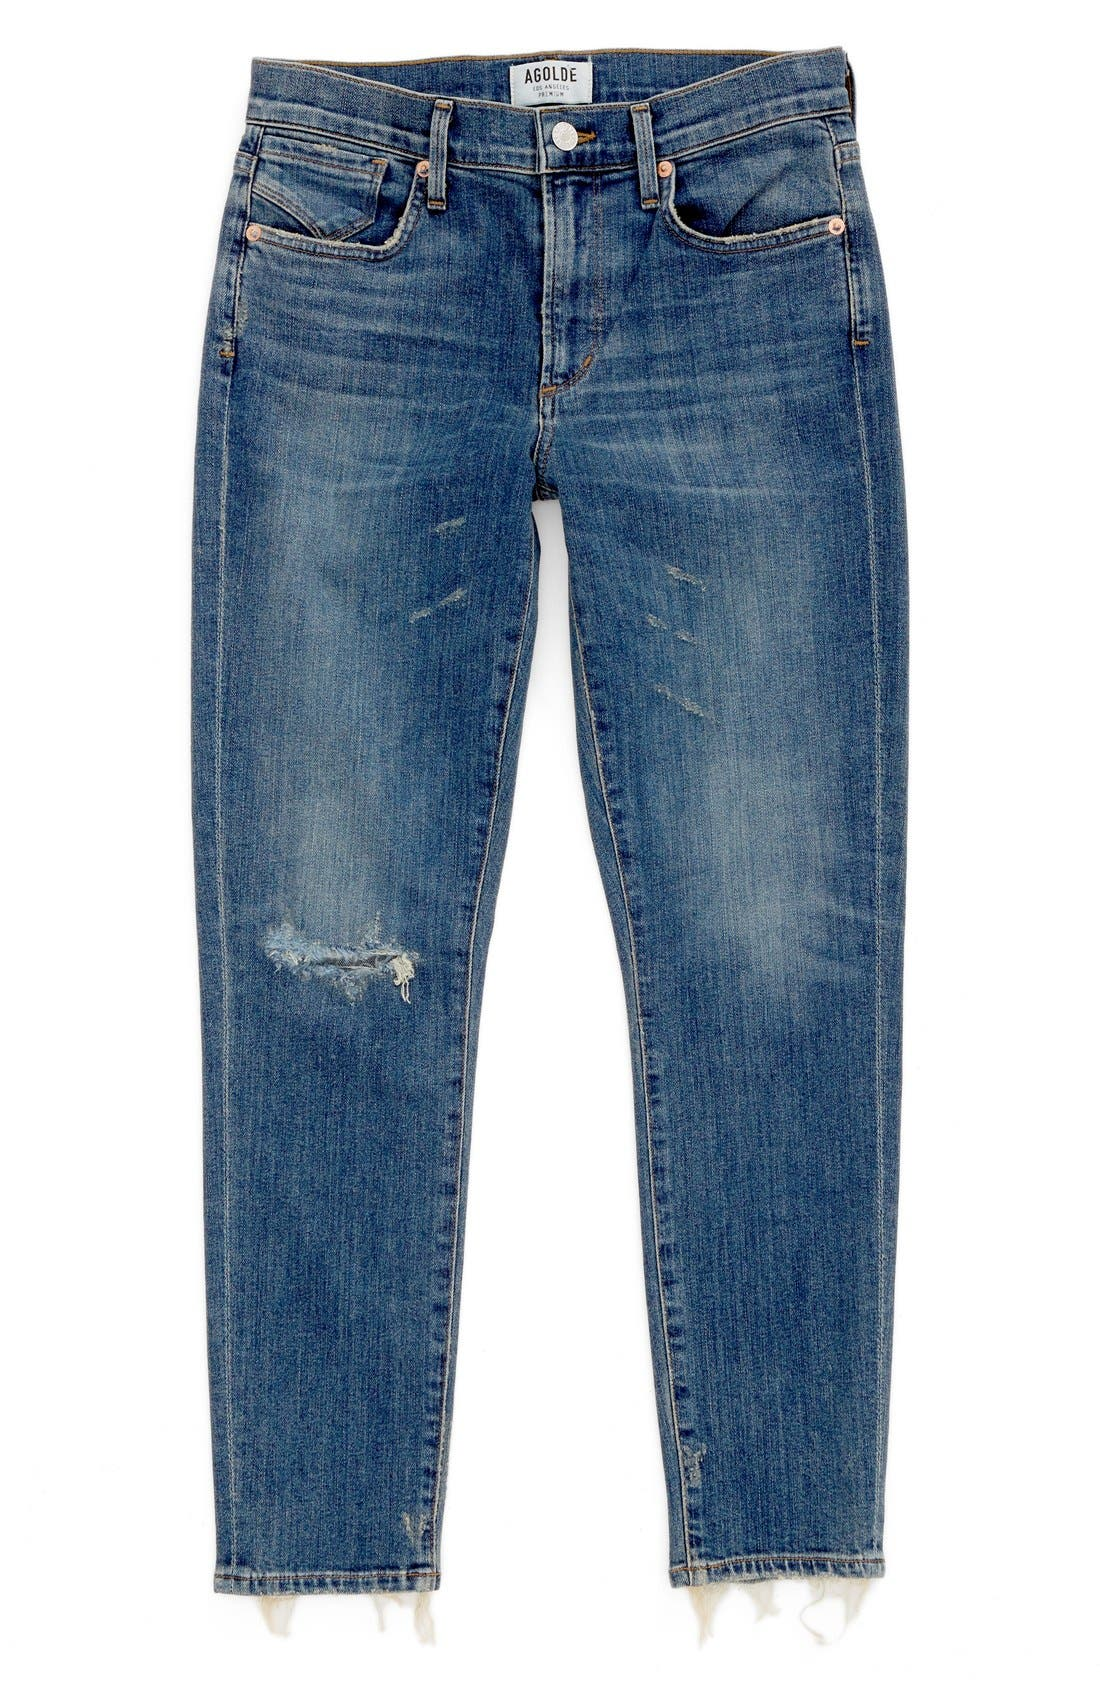 Alternate Image 1 Selected - AGOLDE Sophie Crop High Rise Skinny Jeans (Santa Fe) (Women)